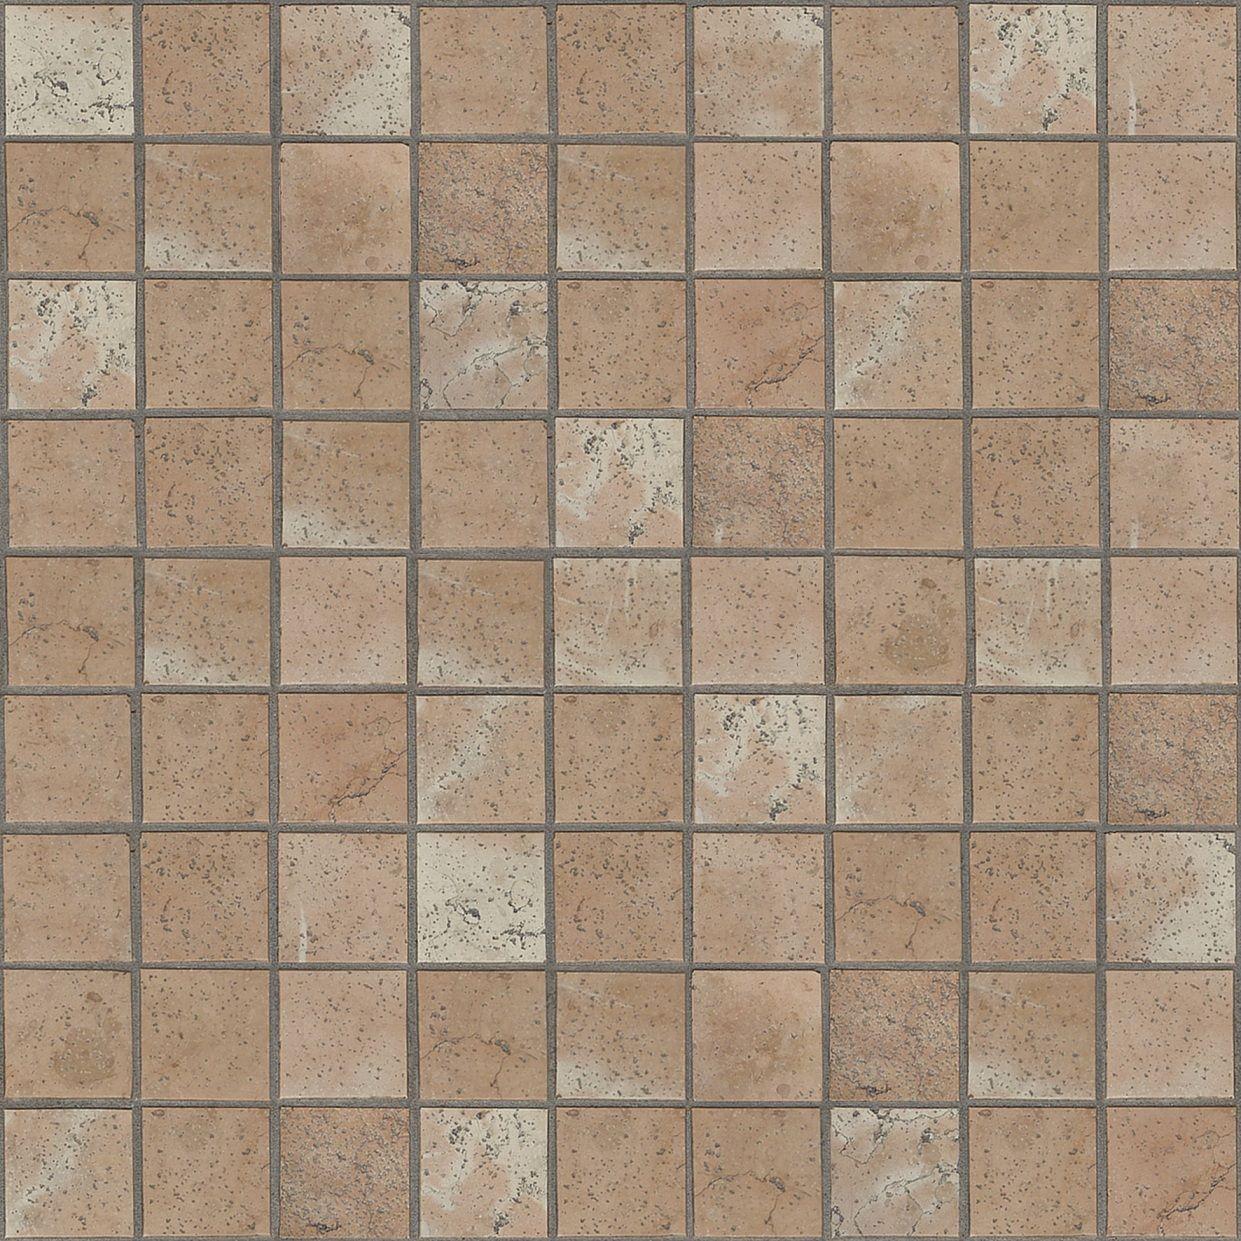 Bathroom Floor Tile Texture Seamless Piastrelle